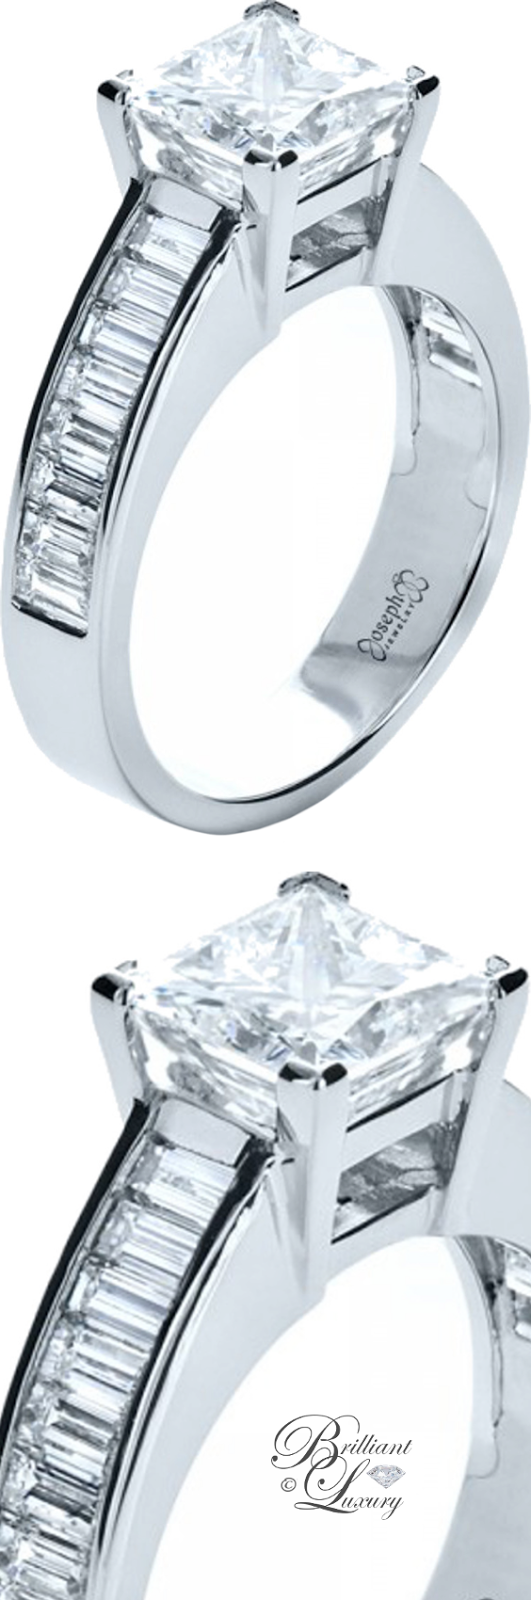 Brilliant Luxury ♦ Custom Princess Cut & Baguette Diamond Engagement Ring